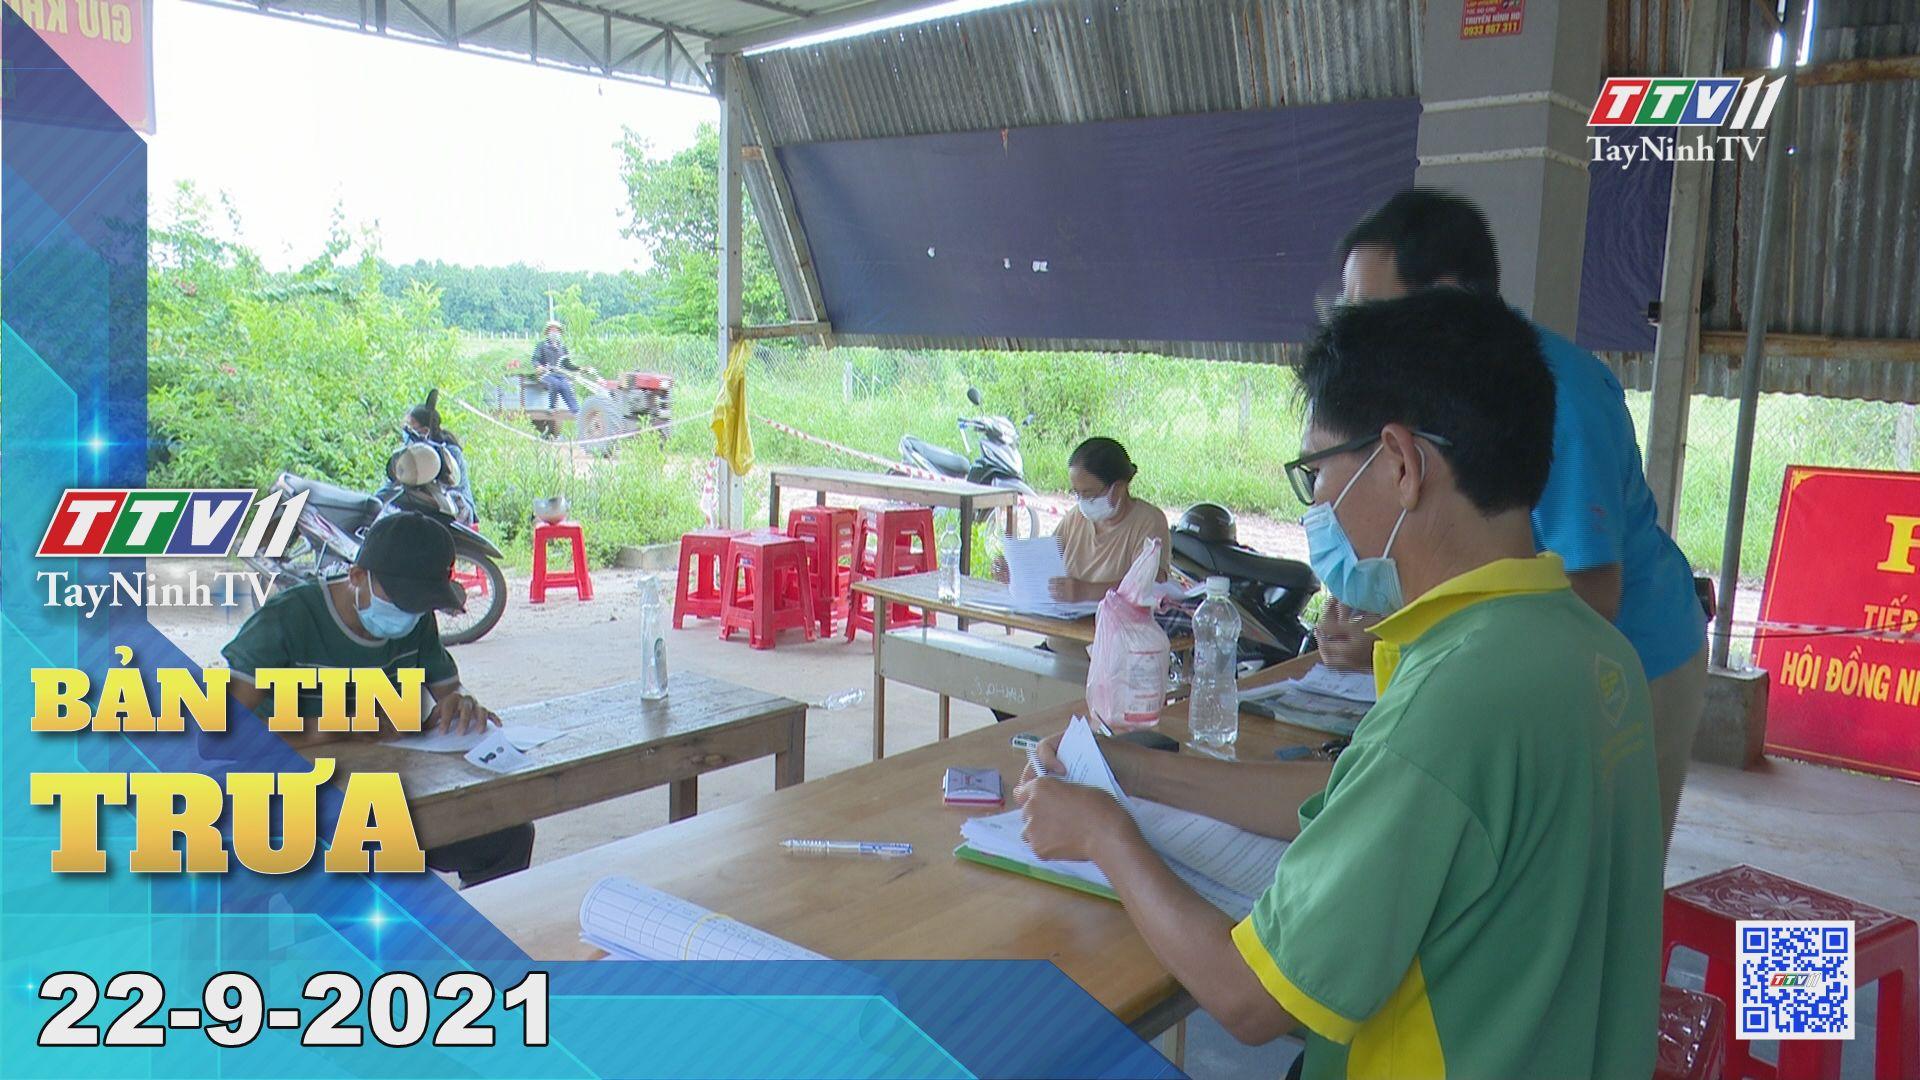 Bản tin trưa 22/9/2021 | Tin tức hôm nay | TayNinhTV